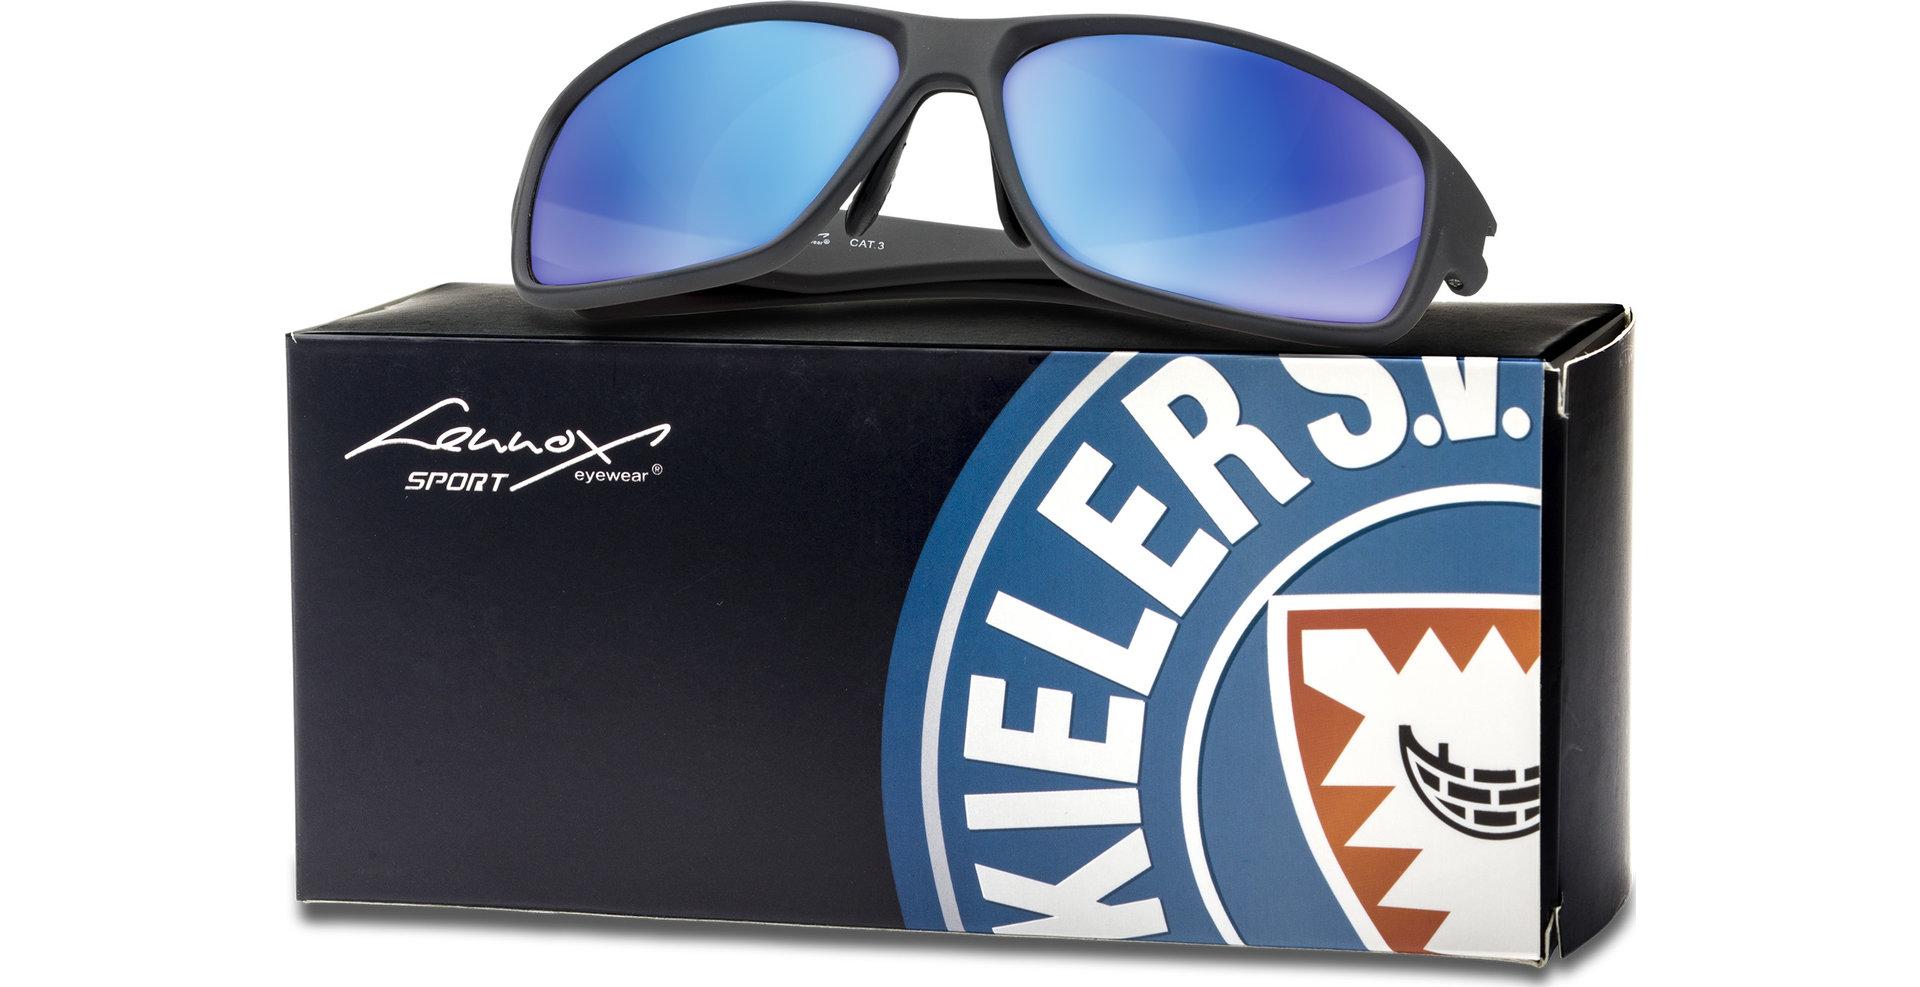 lennox eyewear sports holstein kiel 6215 grau von lensbest. Black Bedroom Furniture Sets. Home Design Ideas